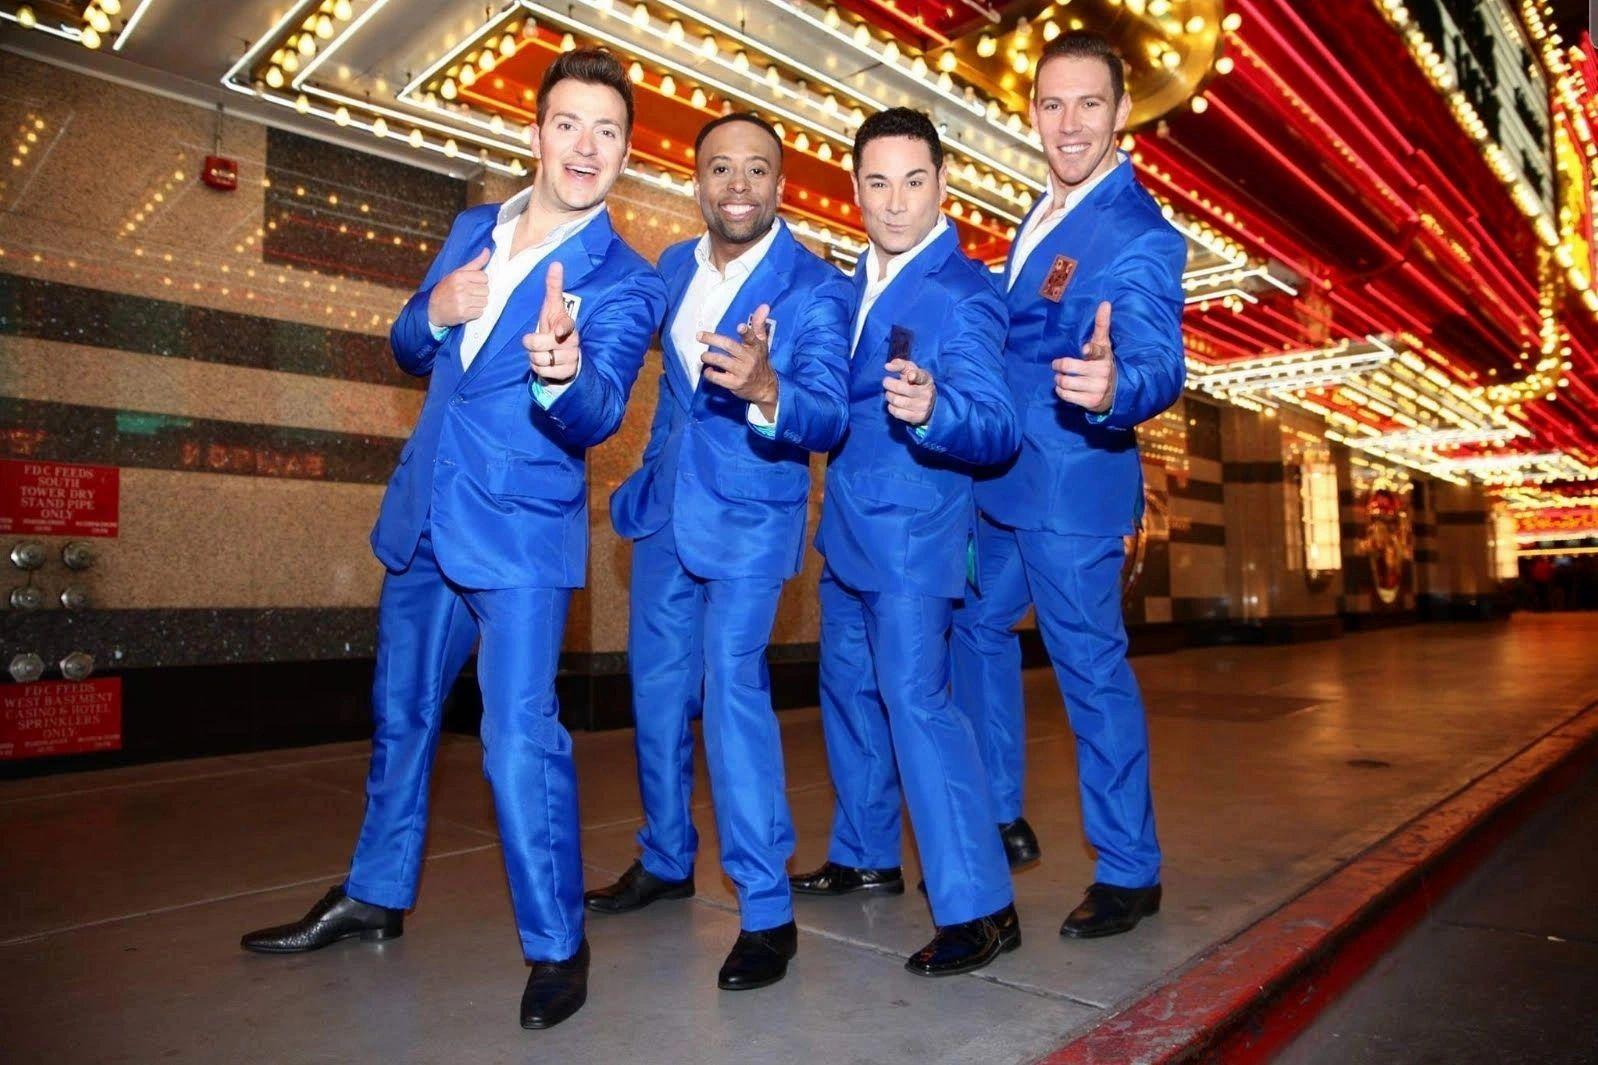 decorative image of four men in blue suits